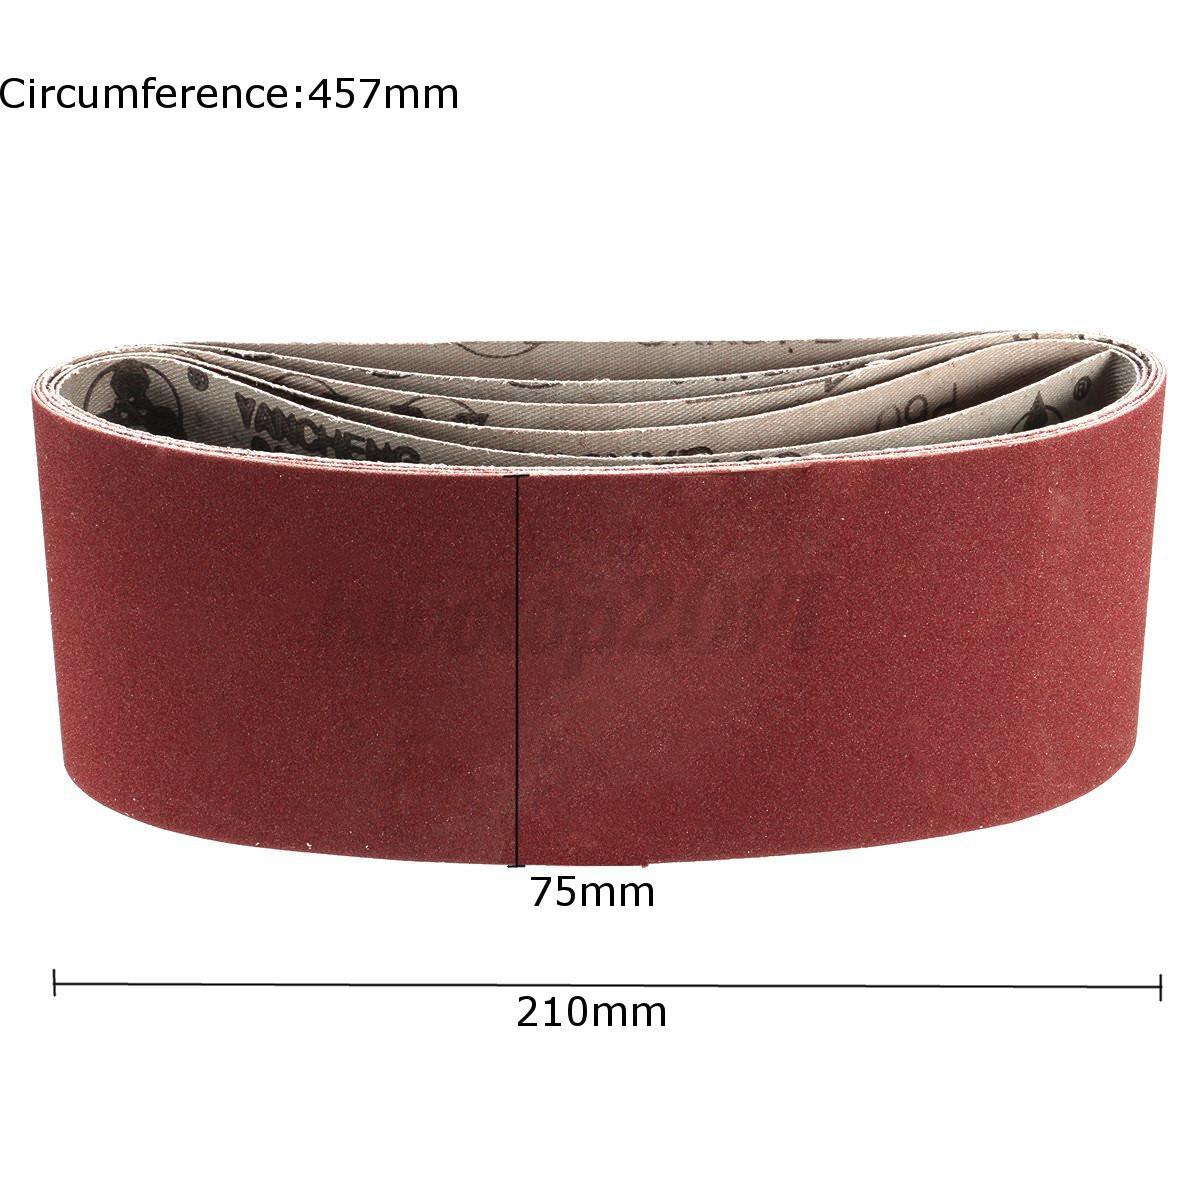 5x 75x457mm 3 x18 Sanding Belts Mixed Grits 60 80 100 120 240 Sand  #793434